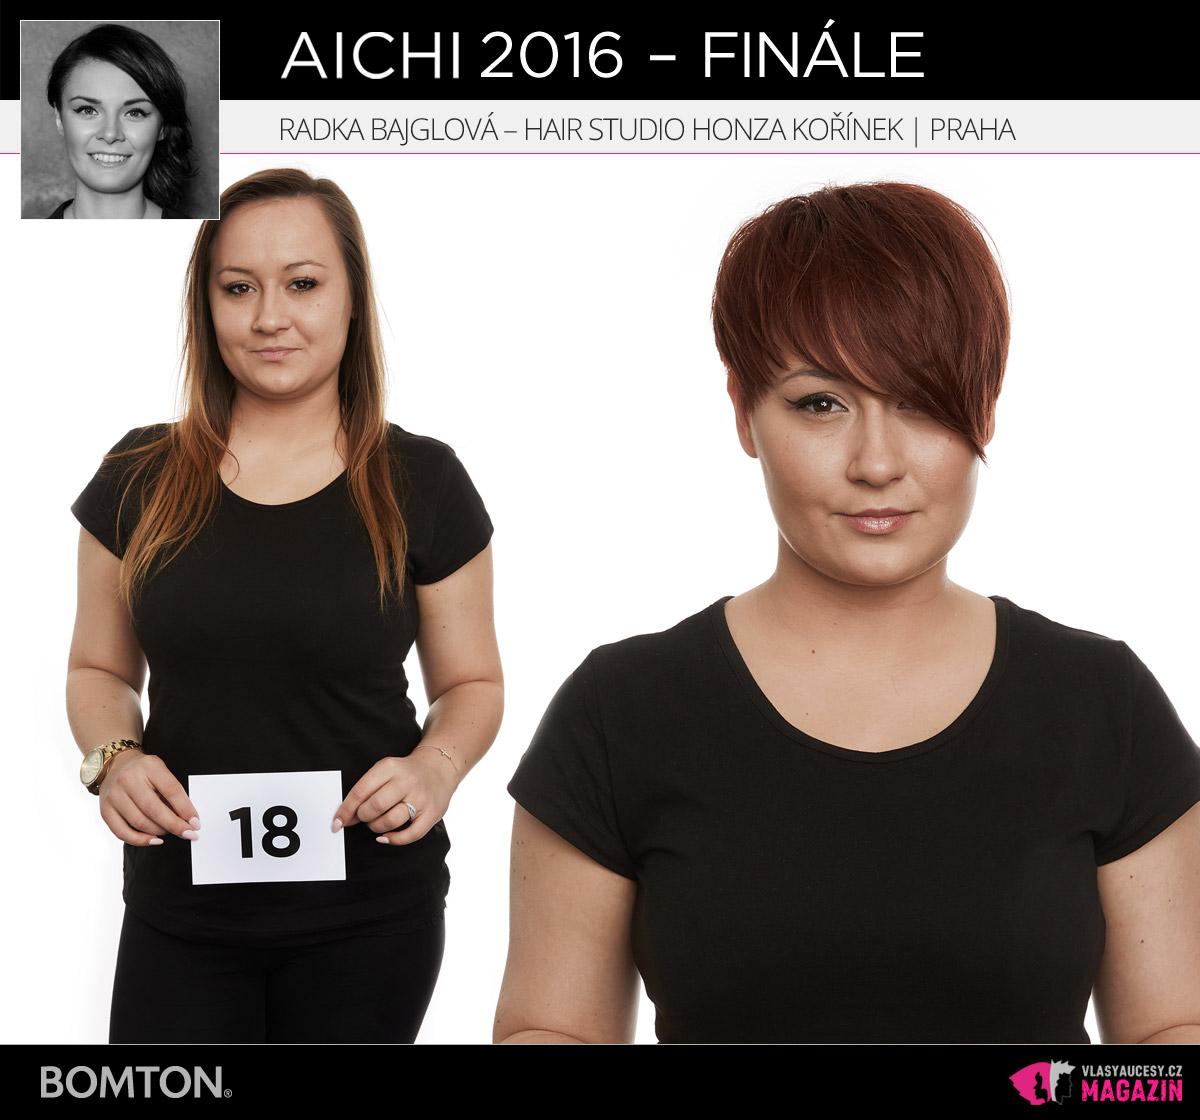 Semifinálová proměna AICHI 2016: Radka Bajglová, Hair studio Honza Kořínek, Praha